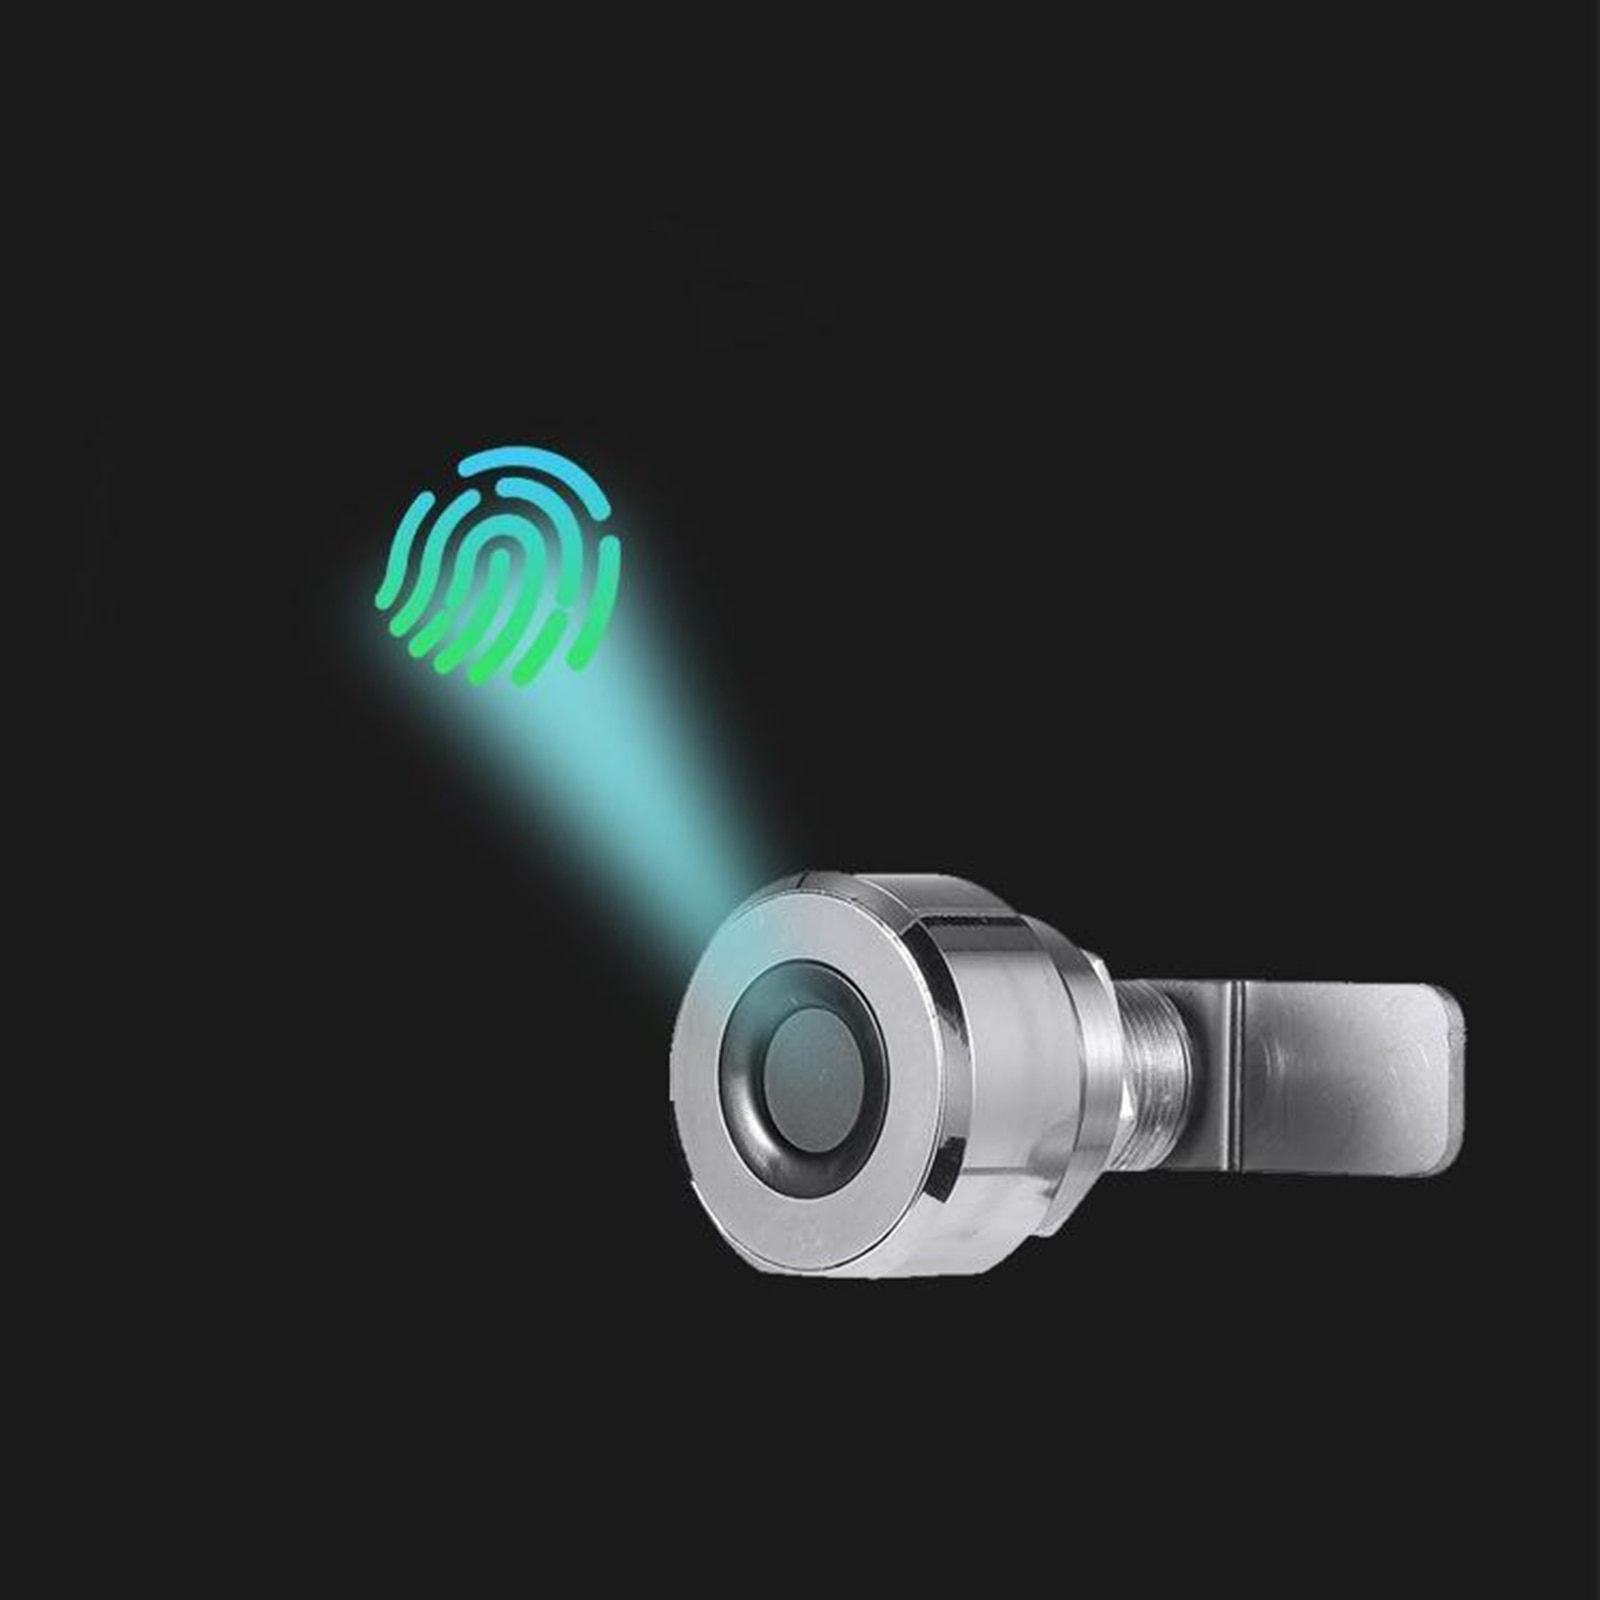 USB قابلة للشحن قفل خزانة إلكتروني قفل ببصمة الأصبع خزانة مخفية لتقوم بها بنفسك تناسب خزانة درج خشبية ، درج ، خزانة خذاء